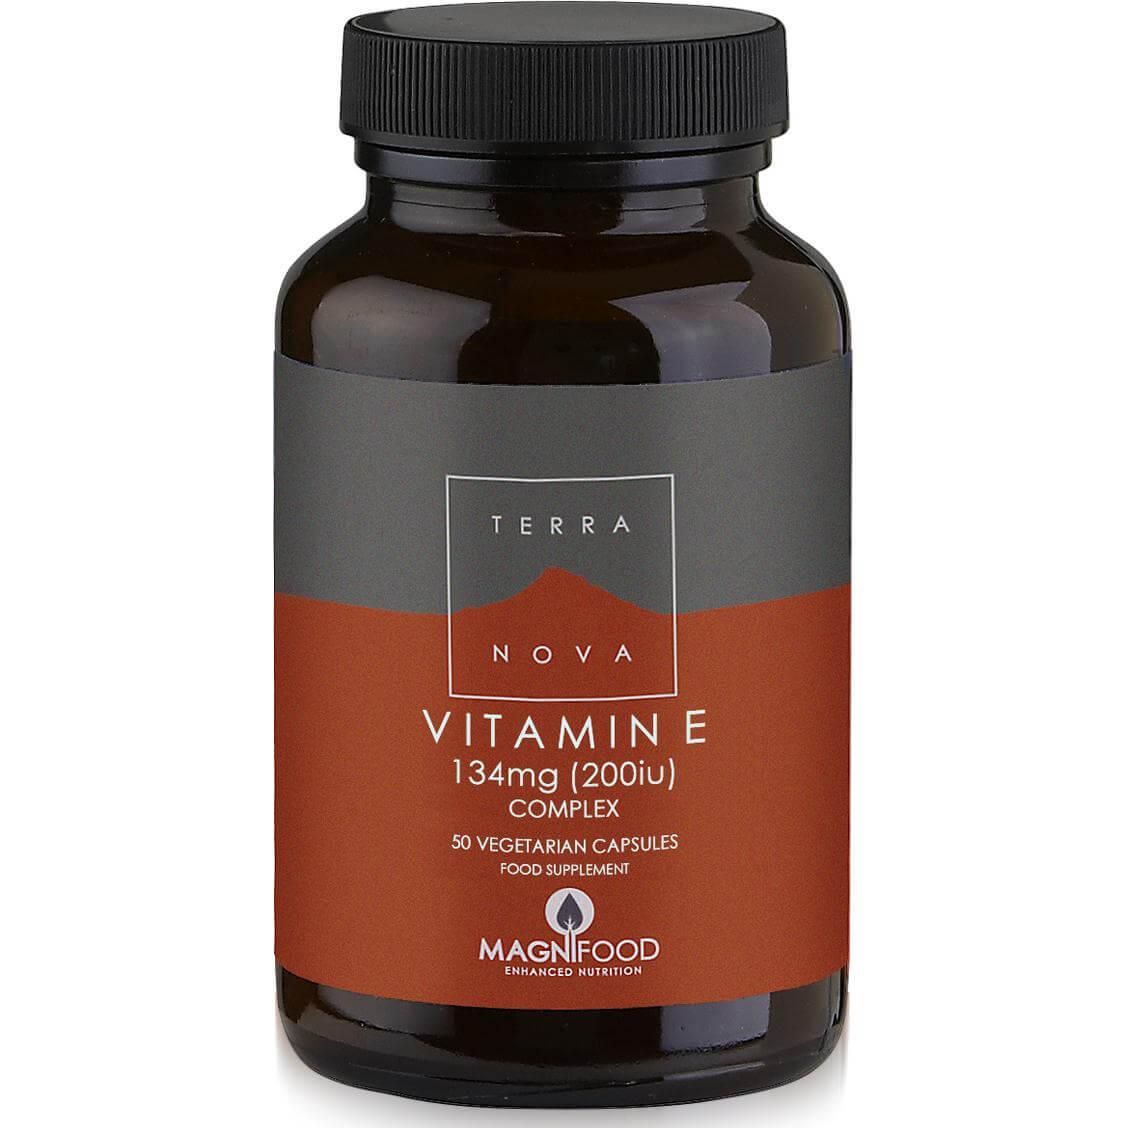 Terranova Vitamin E 200iu 134mg Complex Μοναδική Σύνθεση Βιταμίνης E Φυτικής Προέλευσης με Υπερτροφές 50veg.caps